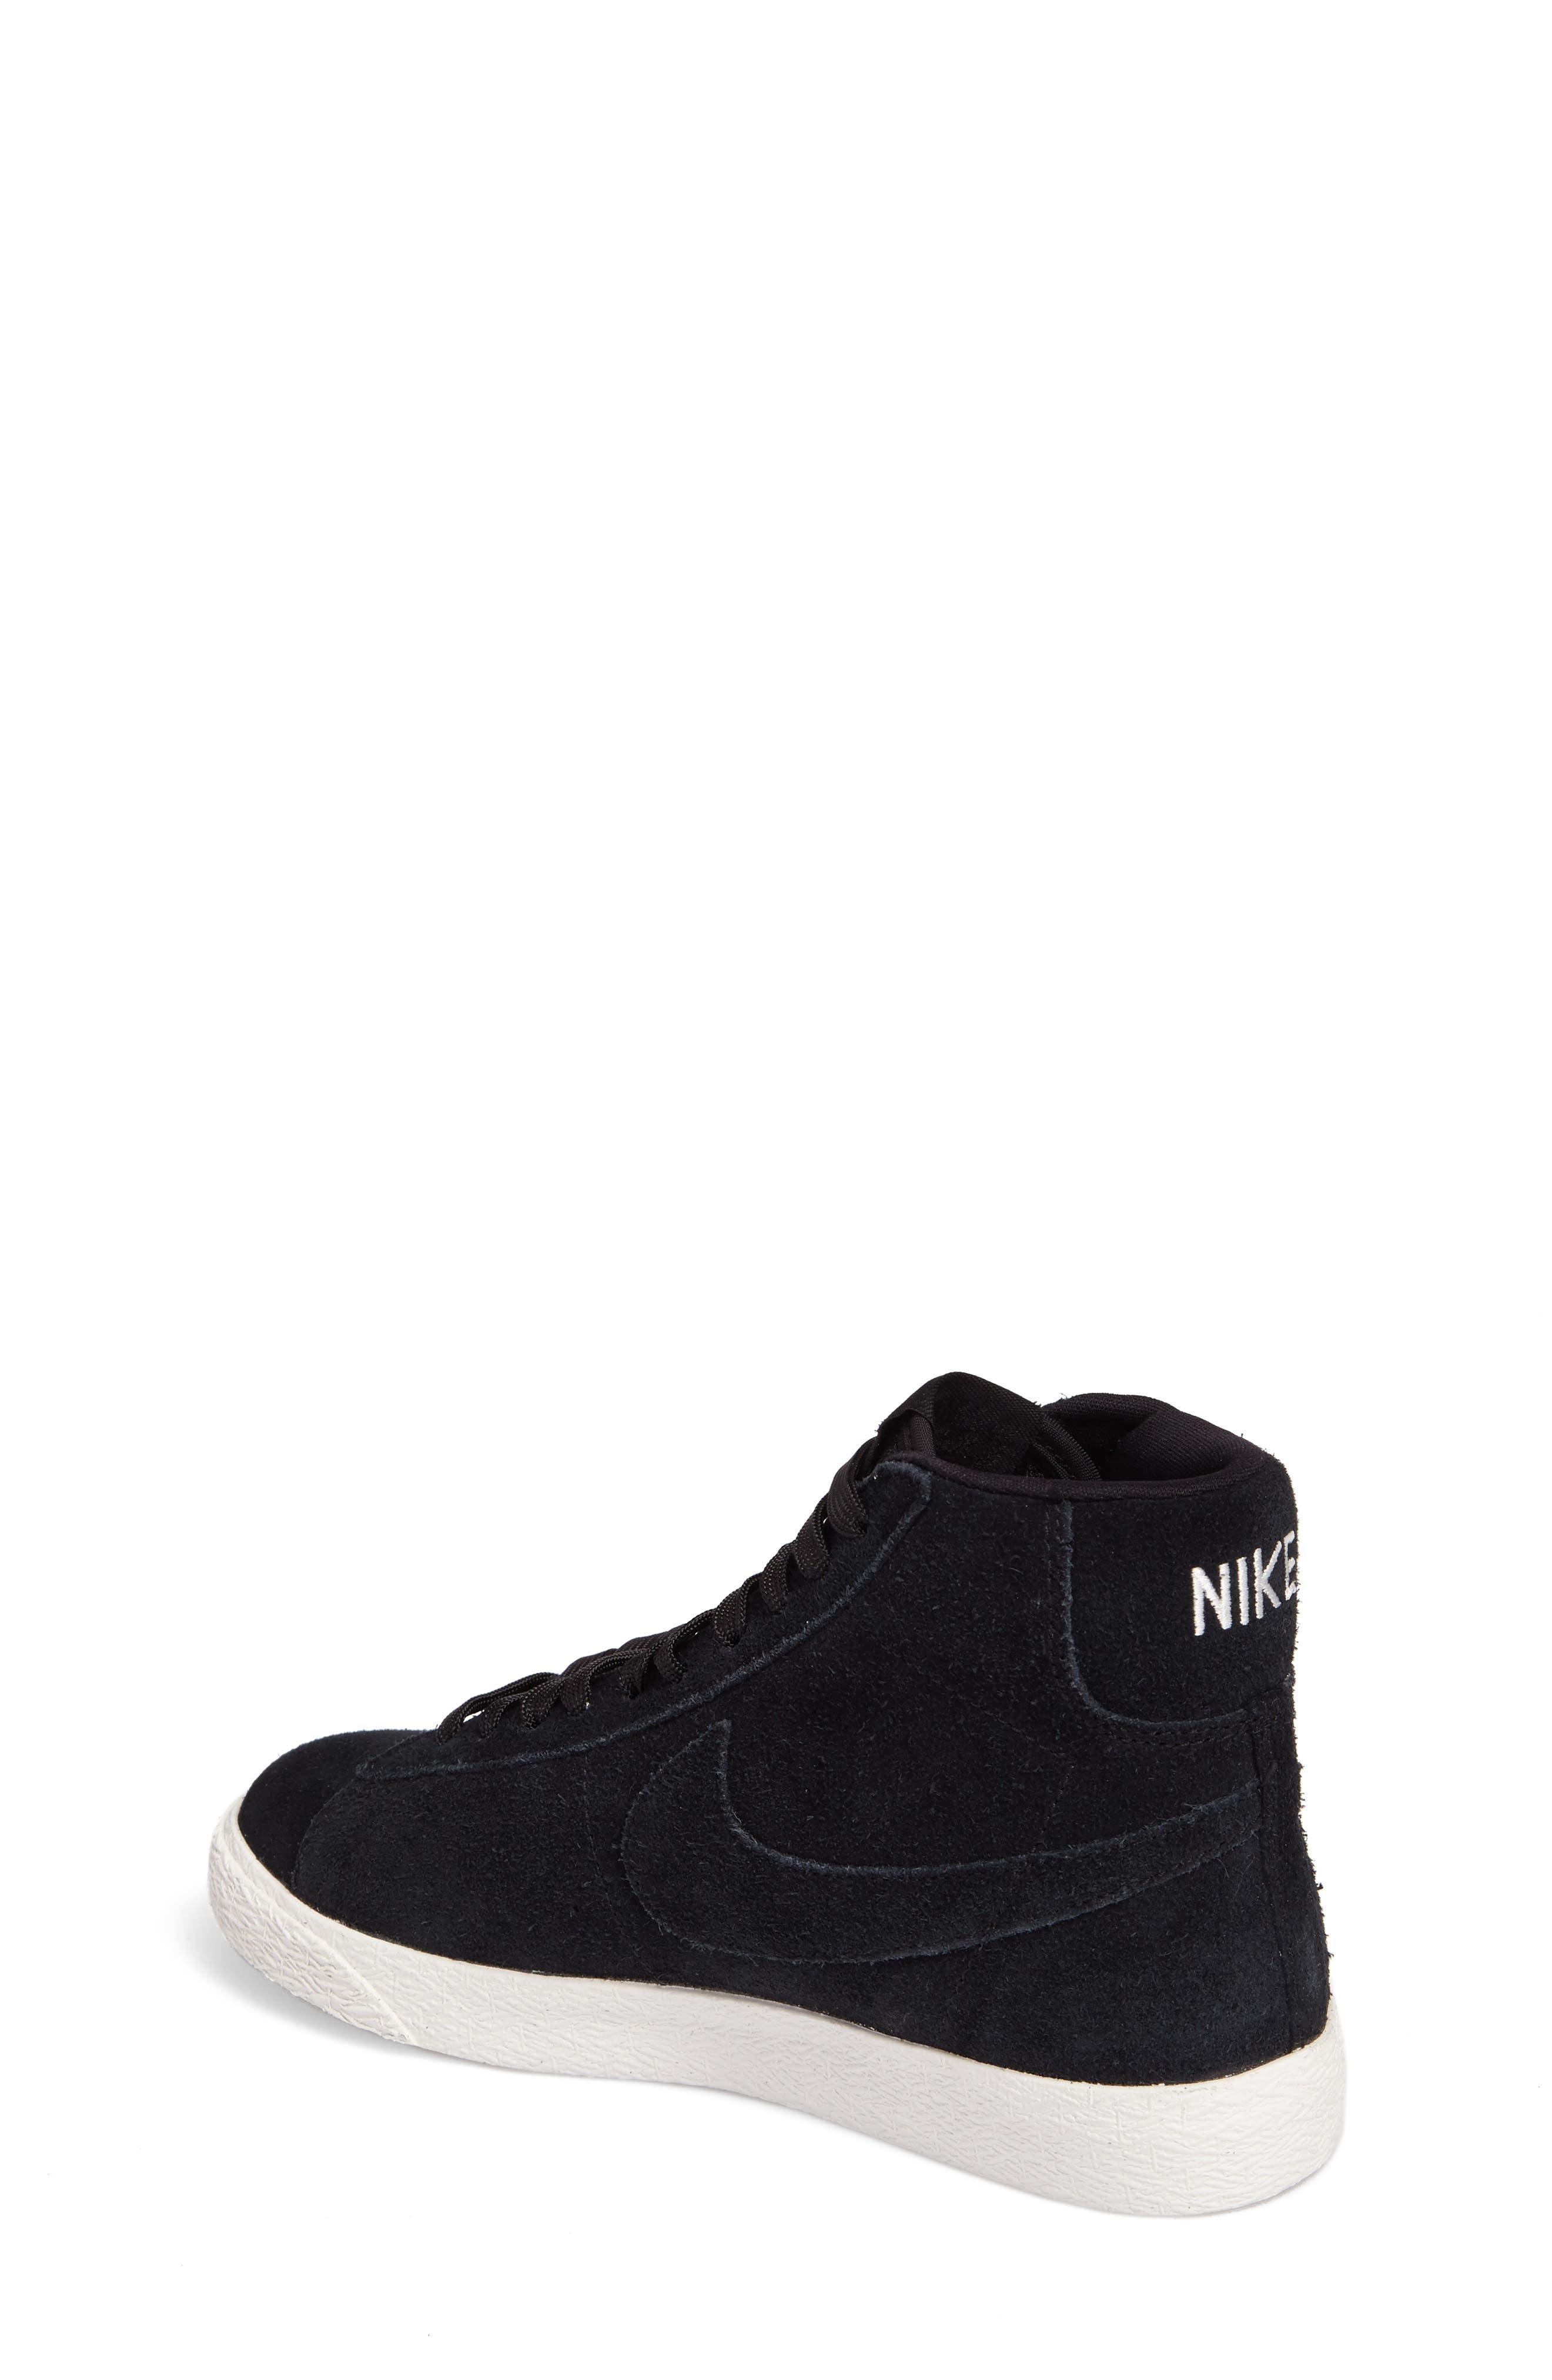 Blazer Mid High Top Sneaker,                             Alternate thumbnail 2, color,                             003